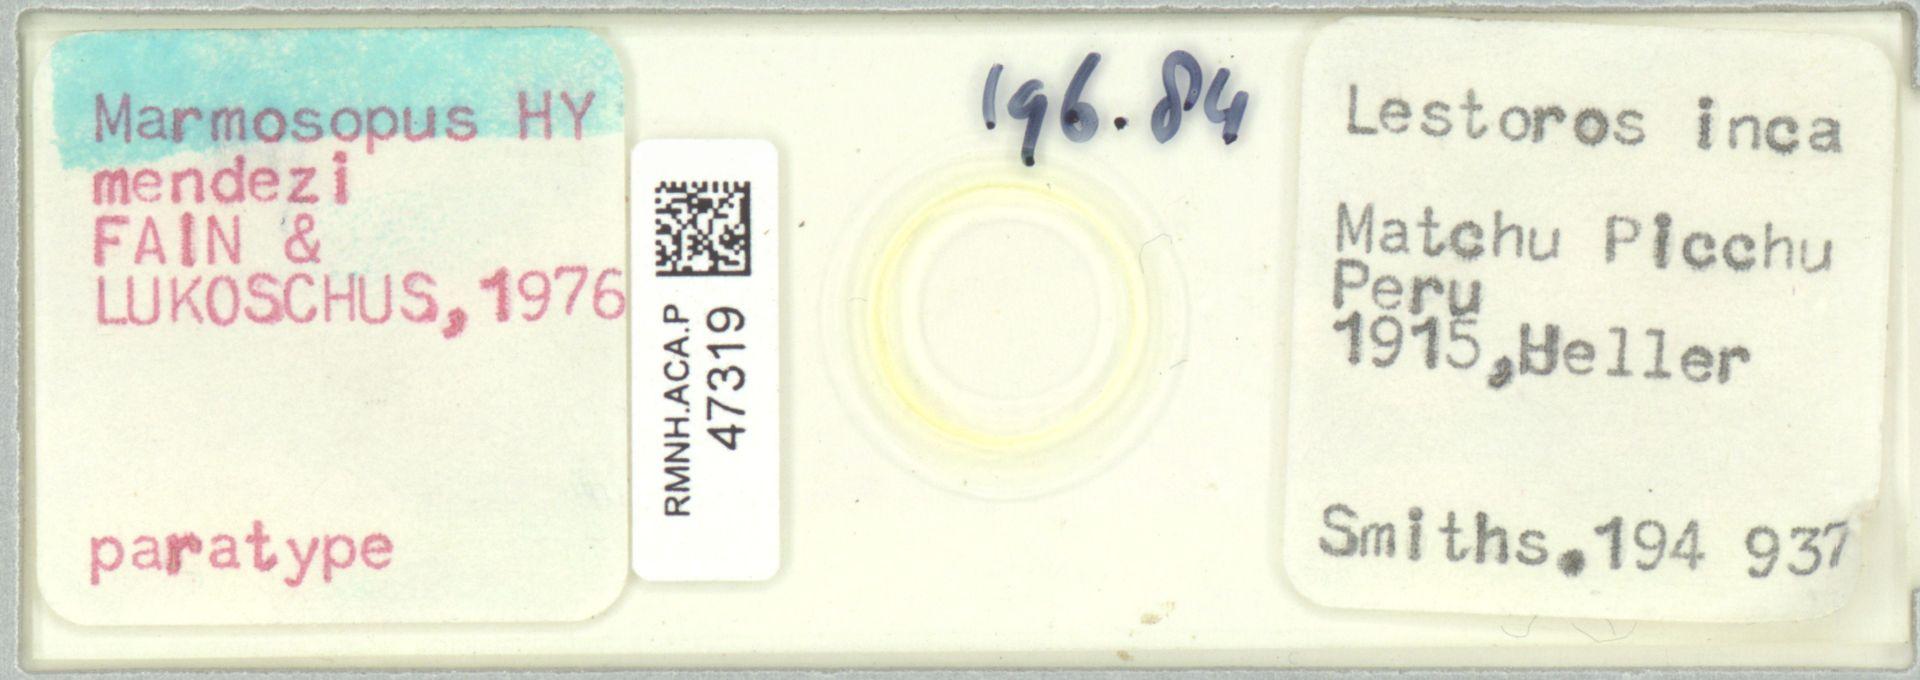 RMNH.ACA.P.47319 | Marmosopus mendezi Fain & Lukoschus 1976